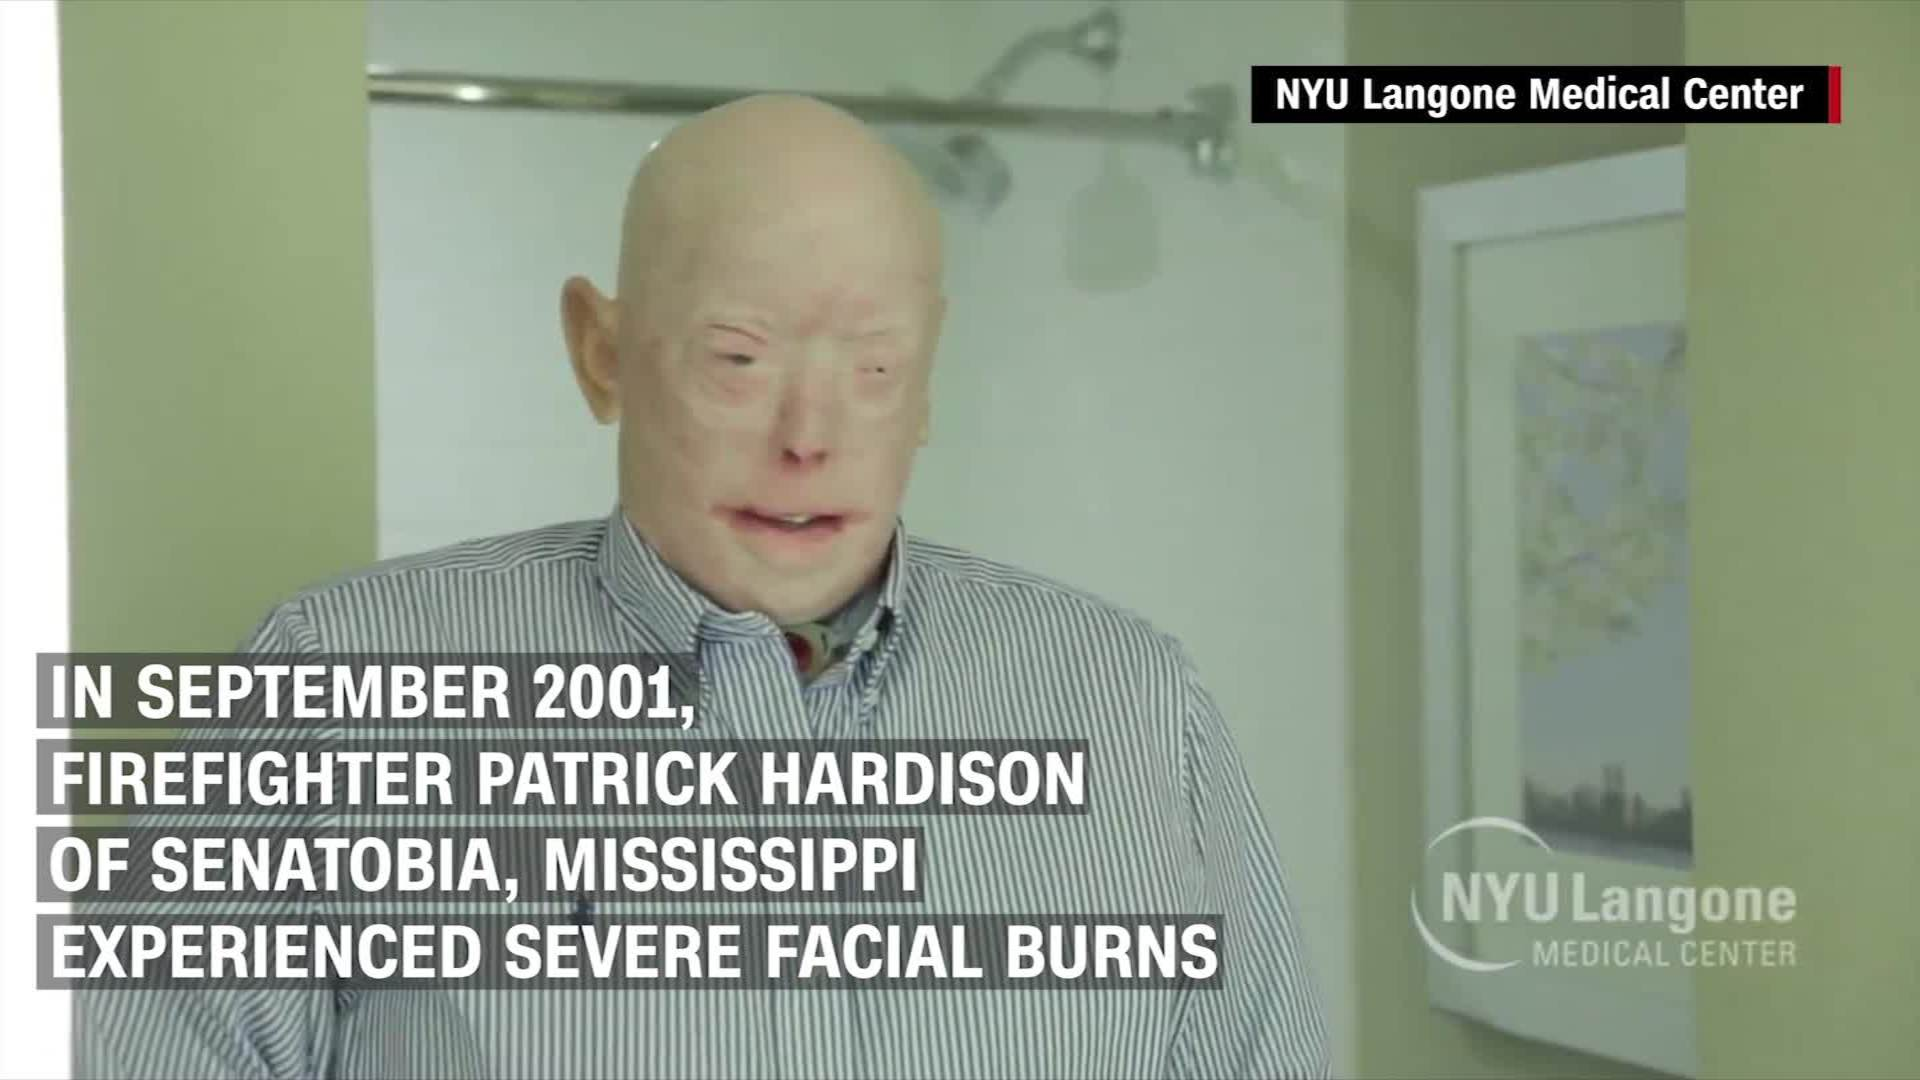 Man gets face transplant after suicide attempt - CNN Video